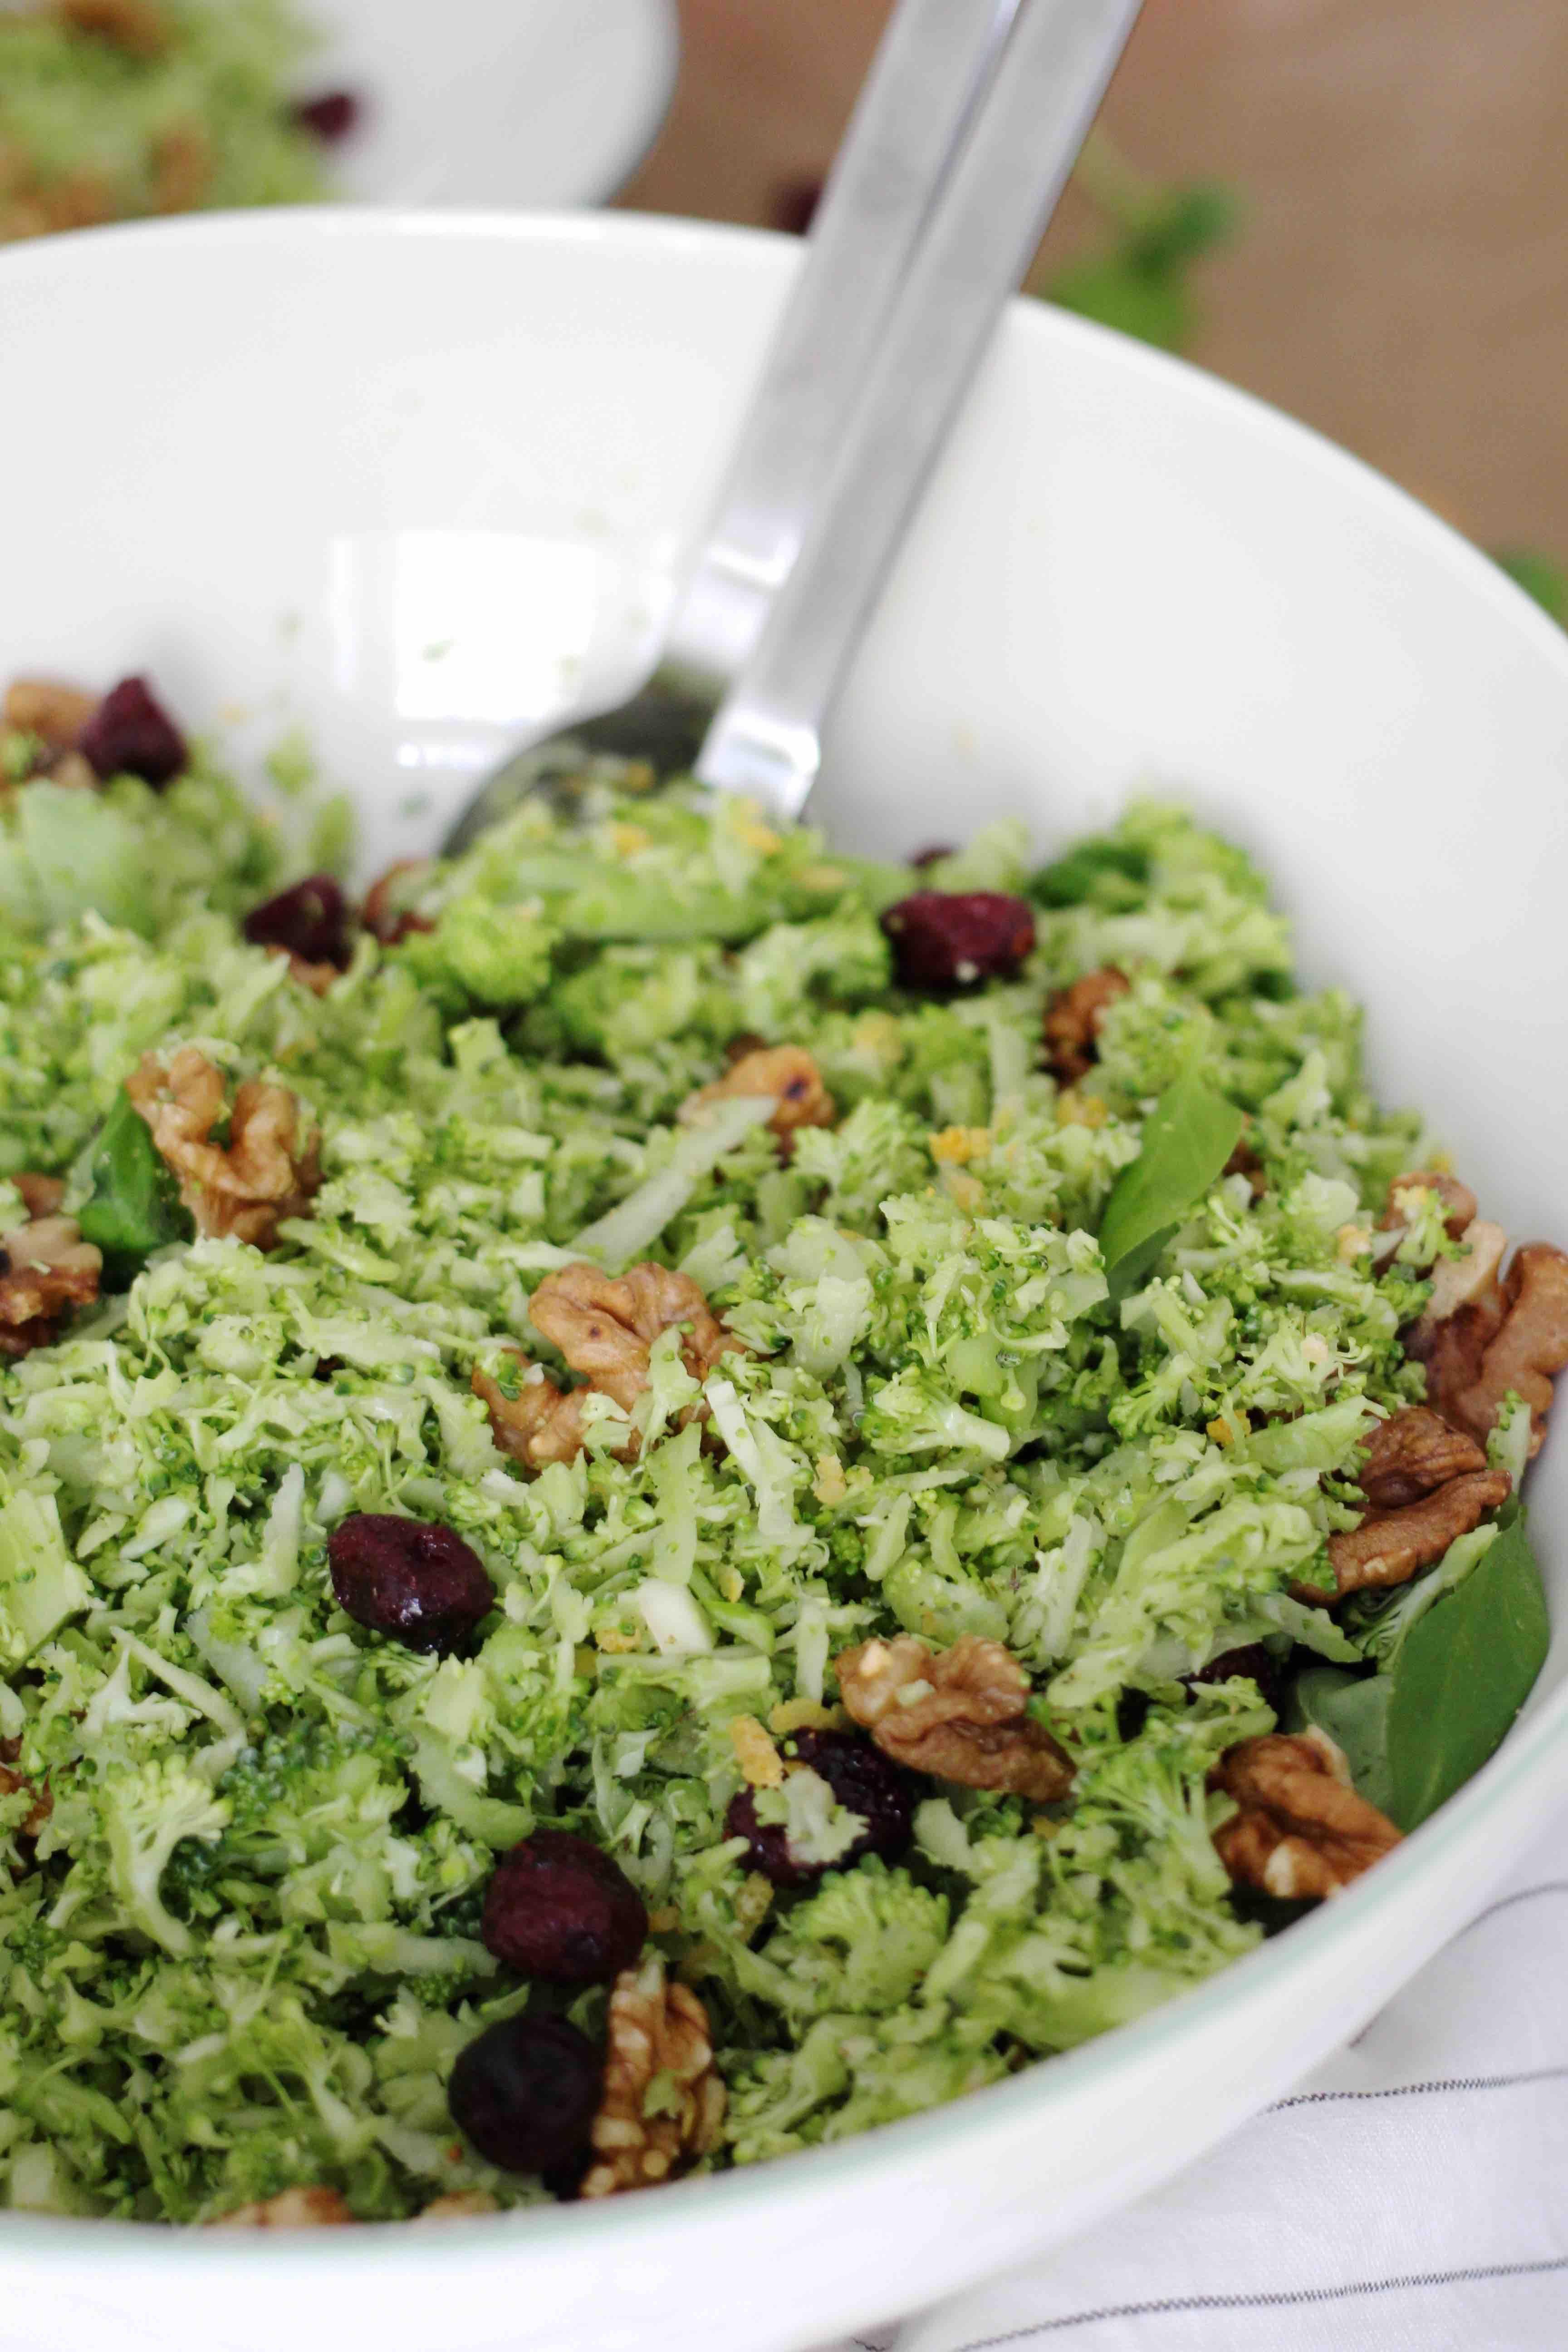 Brokkolisalat mit Nüssen, Broccoli Salad